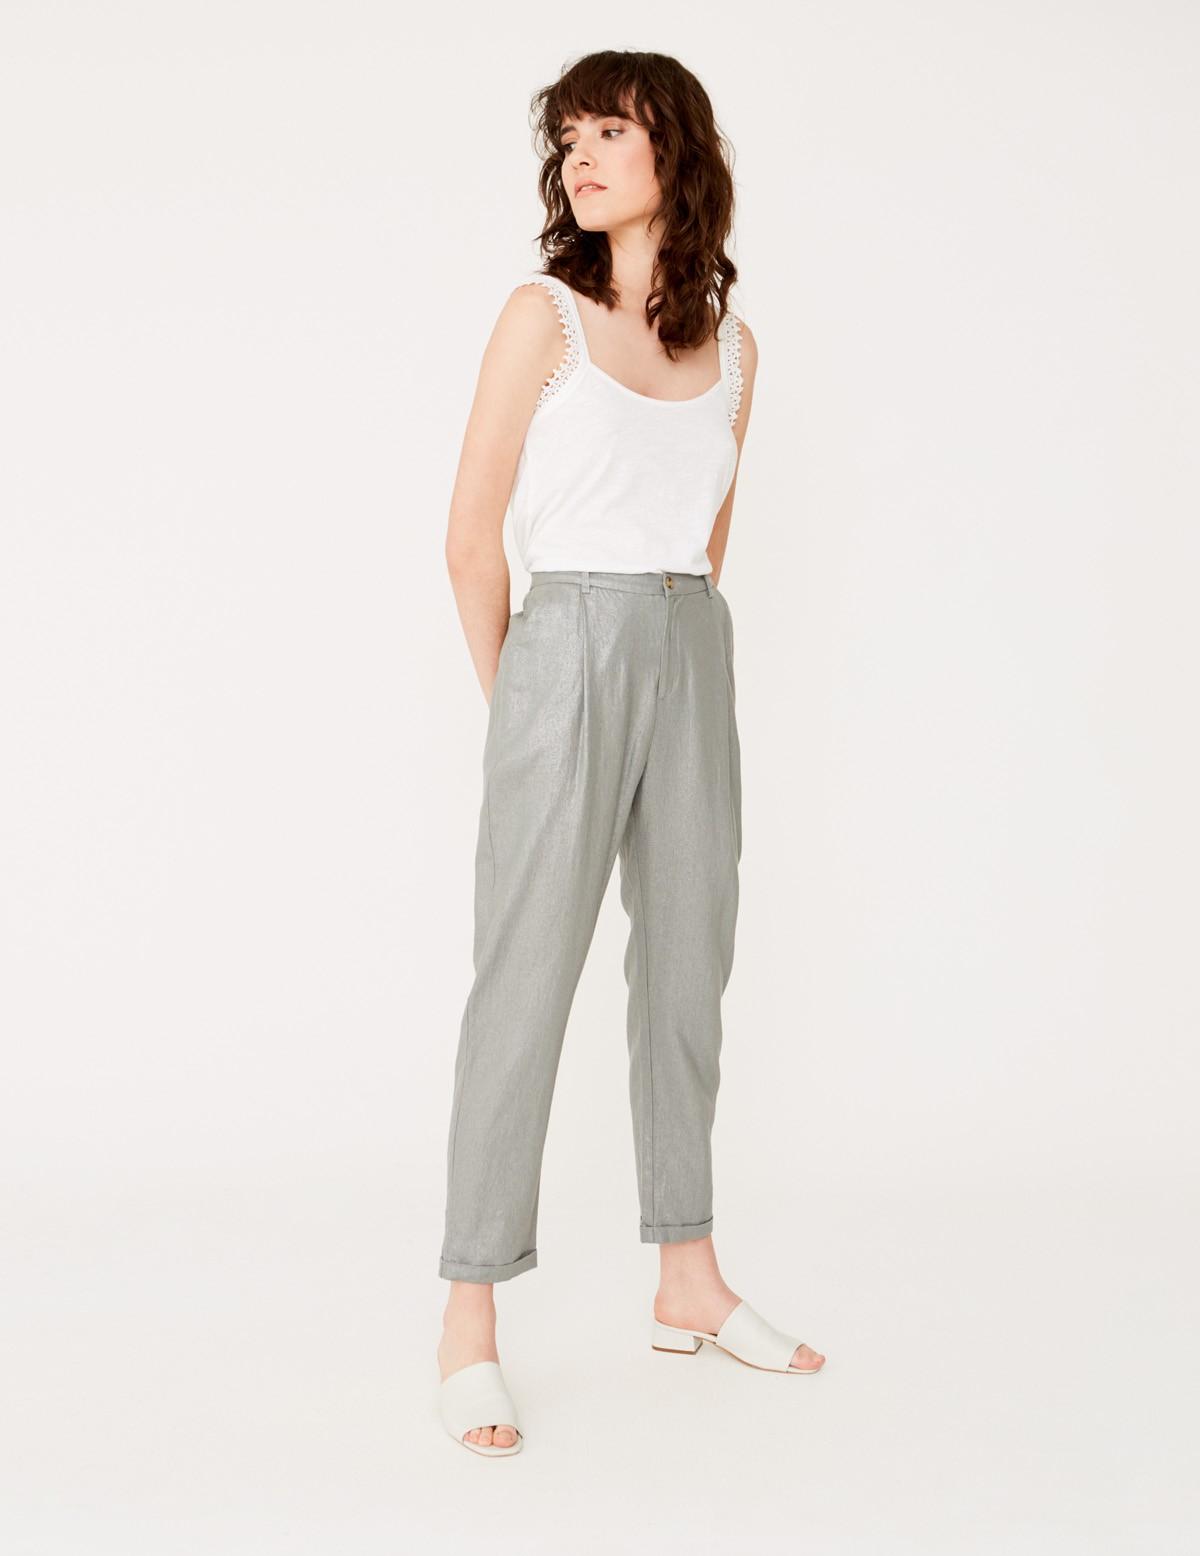 Metallic linen trousers